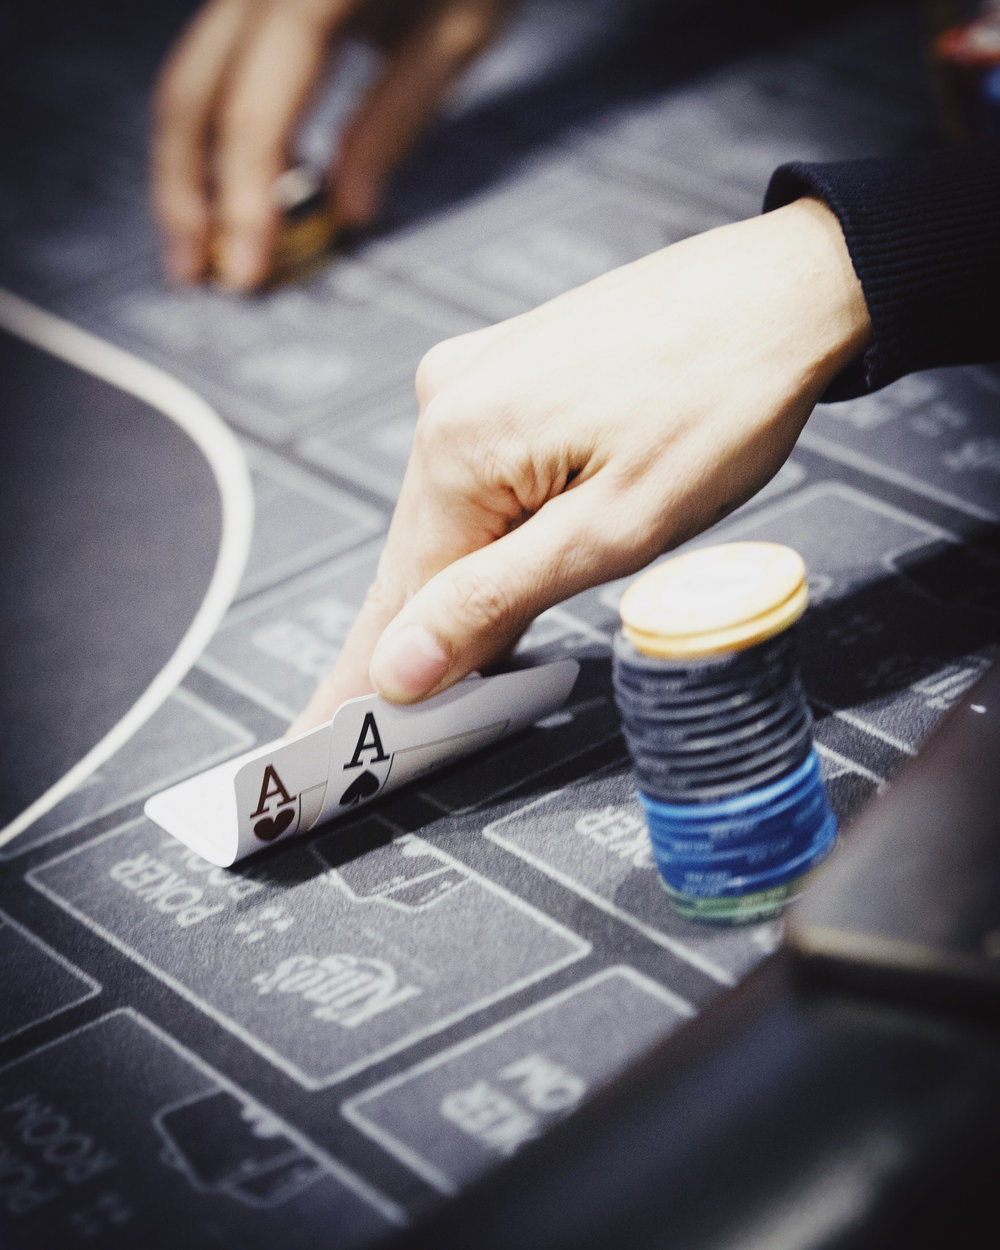 polina-shubkina-poker-009.JPG